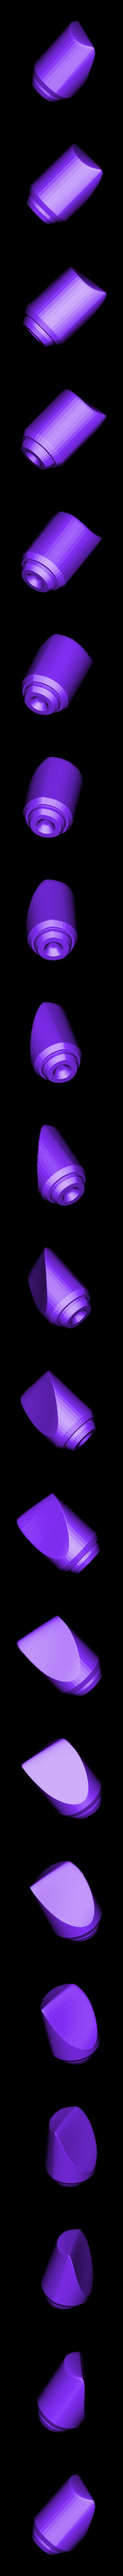 Lucio_plug_rgt.stl Download free STL file Overwatch Lucio Blaster • 3D printer object, Adafruit